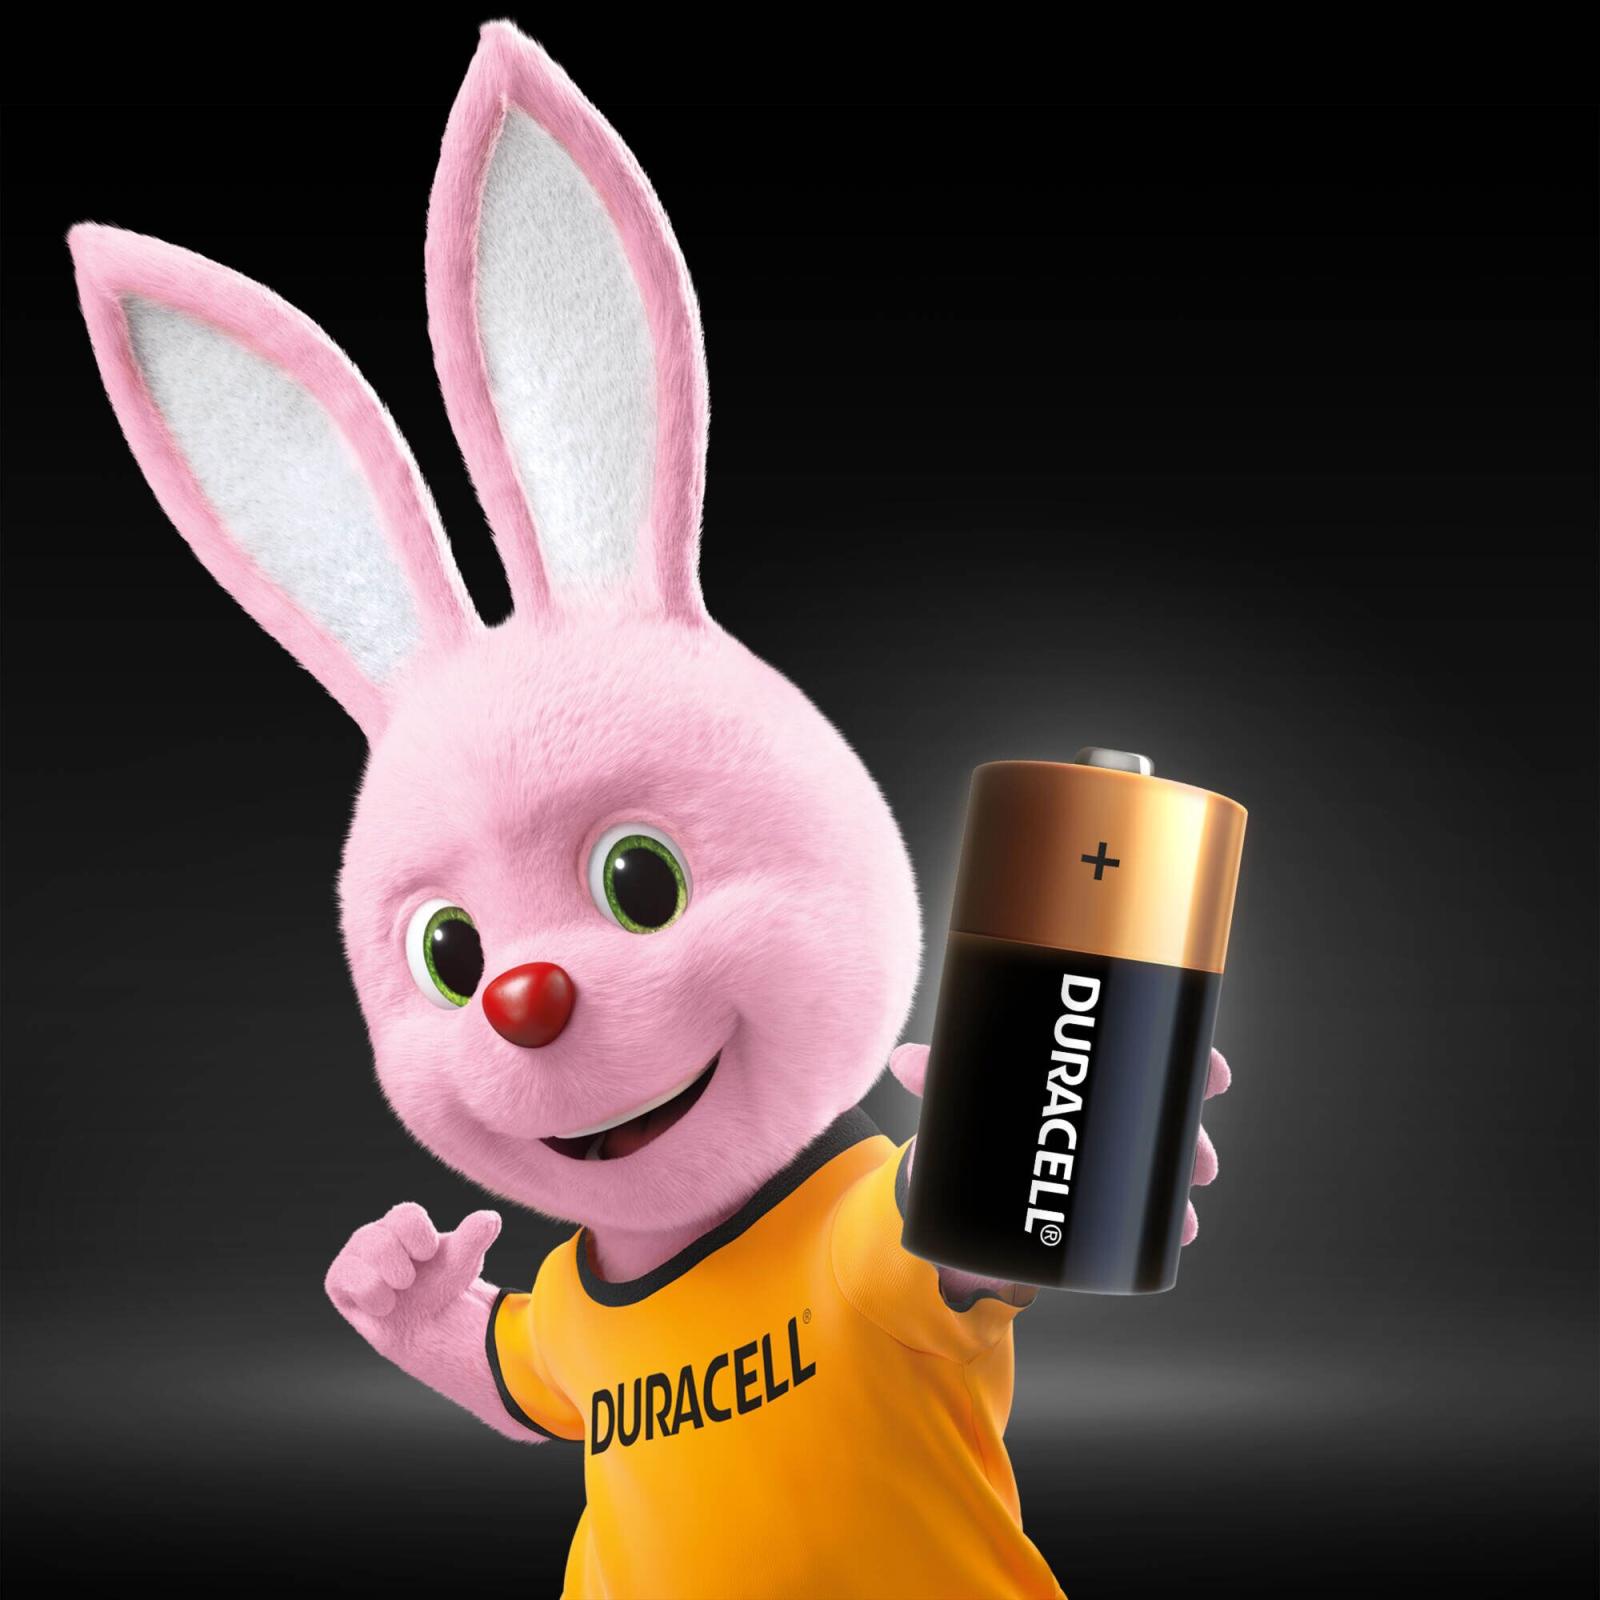 Батарейка C LR14 * 2 Duracell (5000394052529 / 81483545) изображение 3